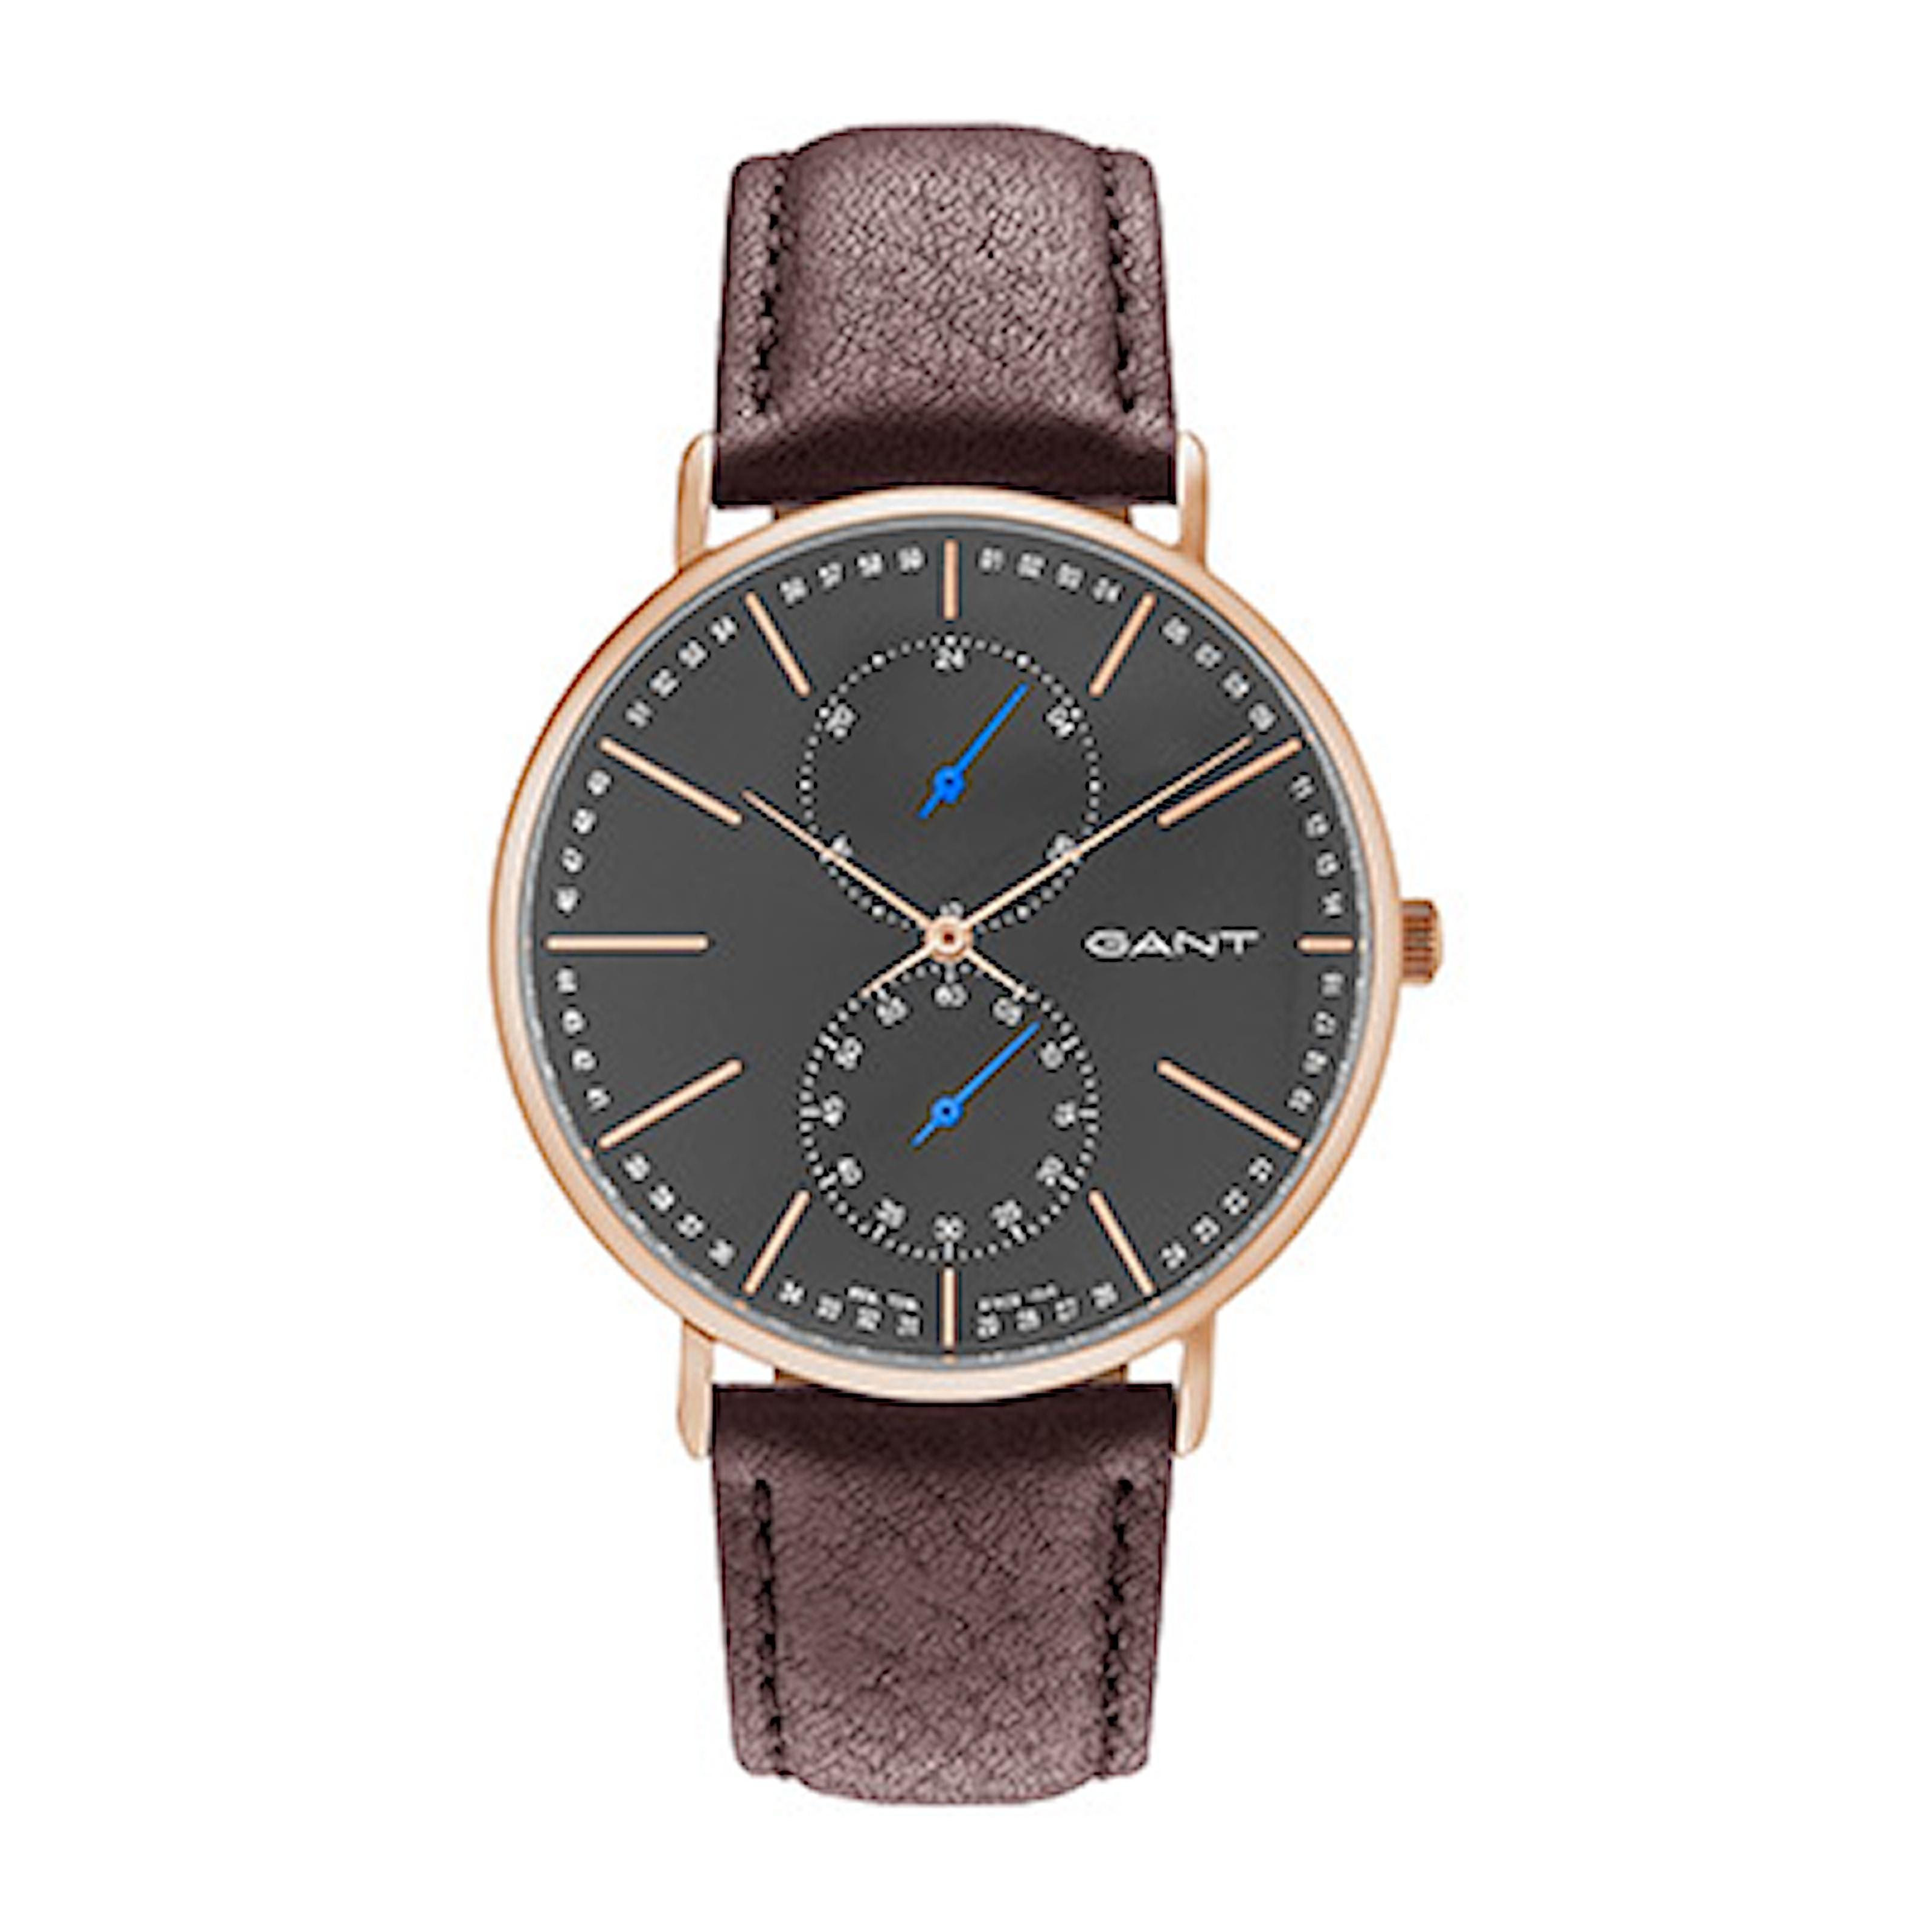 GT036005, GT036005, Armband: brun, läder. Urtavla: mörkgrå, rostfritt stål. Mått: 41 mm,